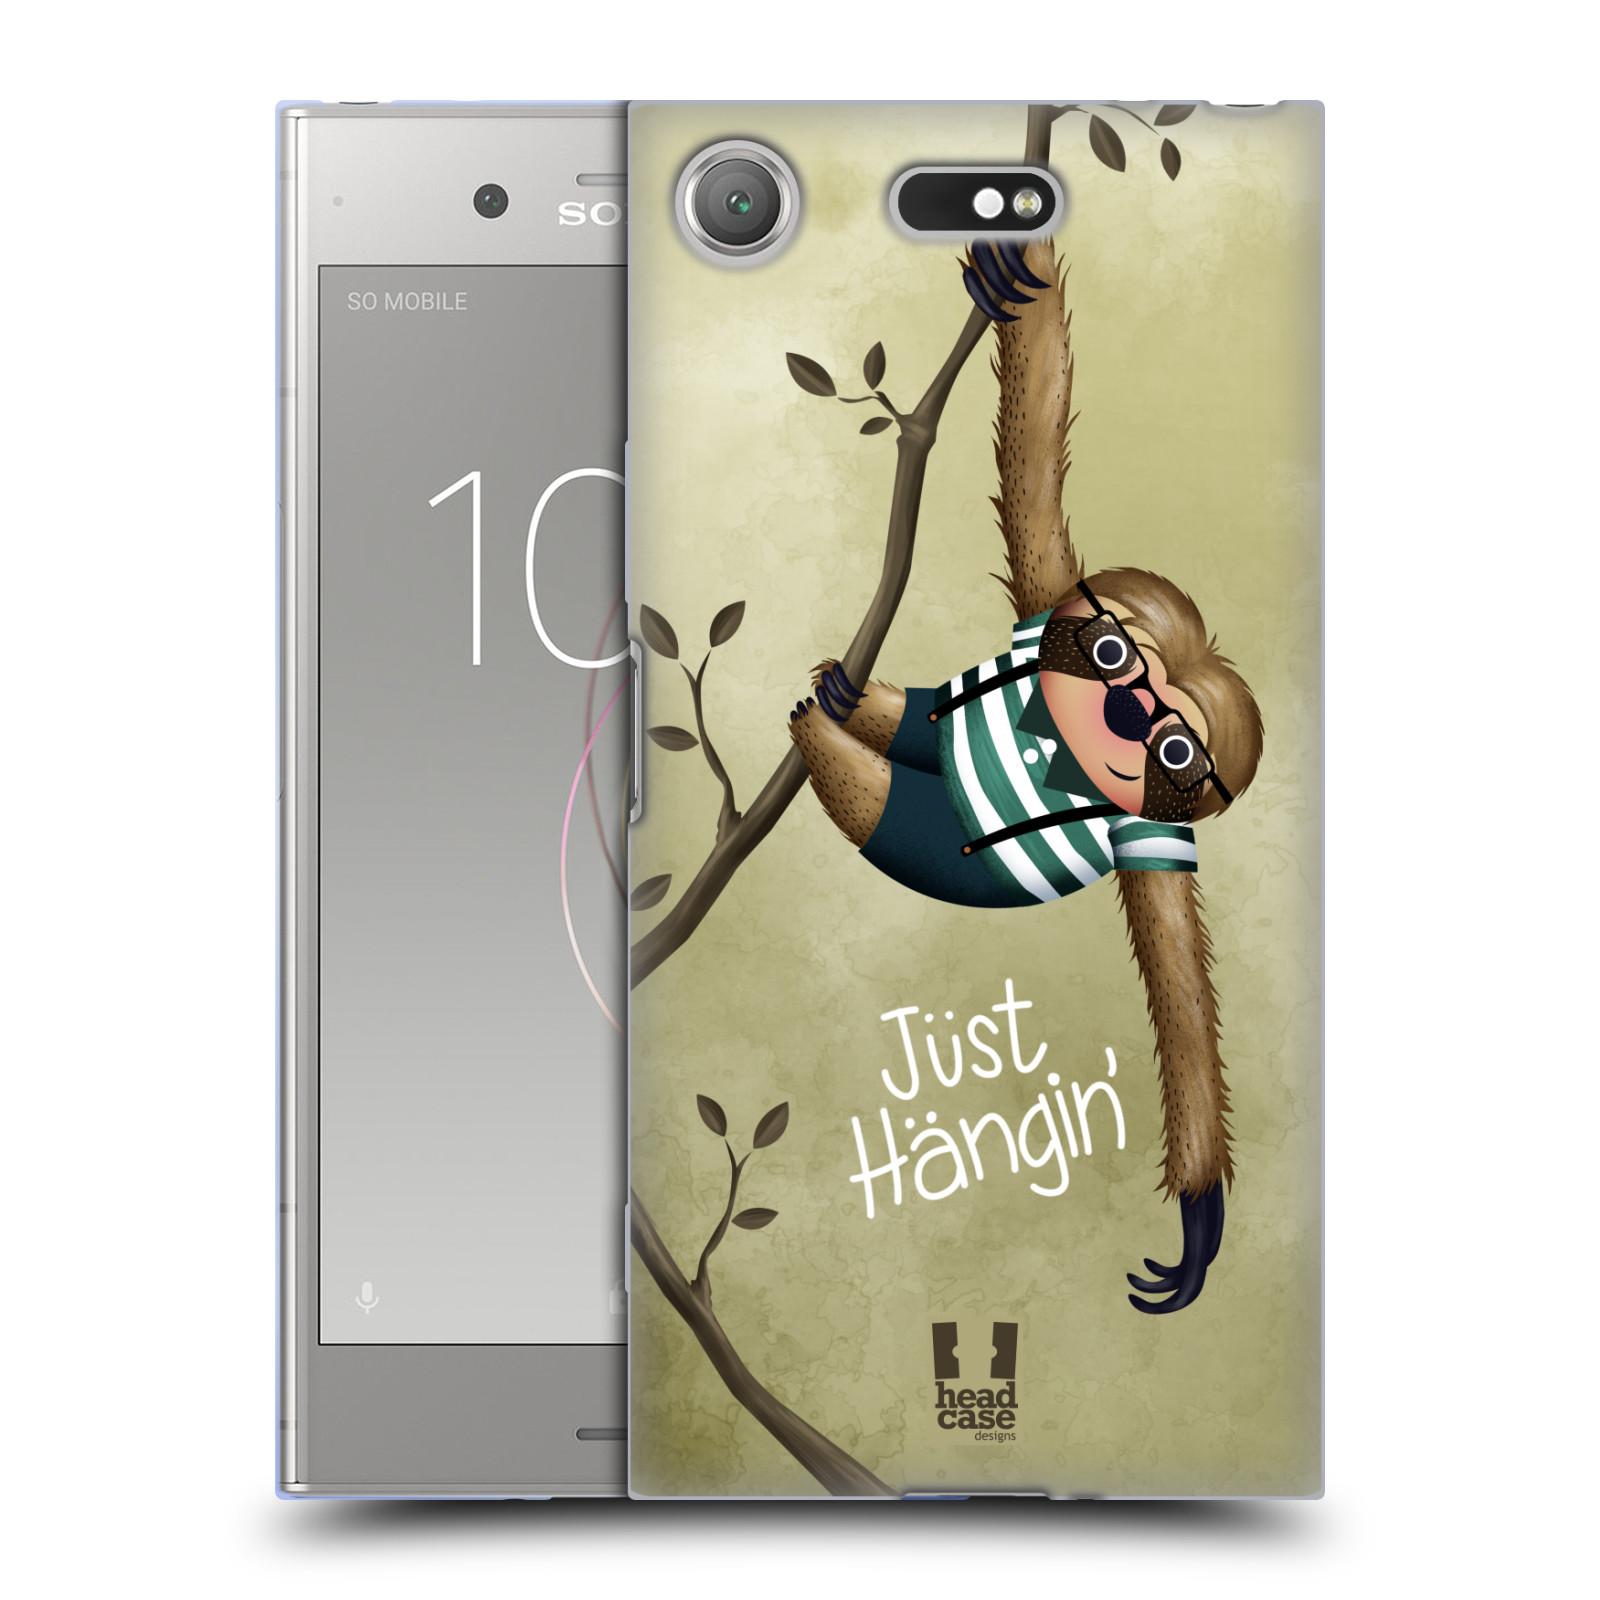 Silikonové pouzdro na mobil Sony Xperia XZ1 Compact - Head Case - Lenochod Just Hangin